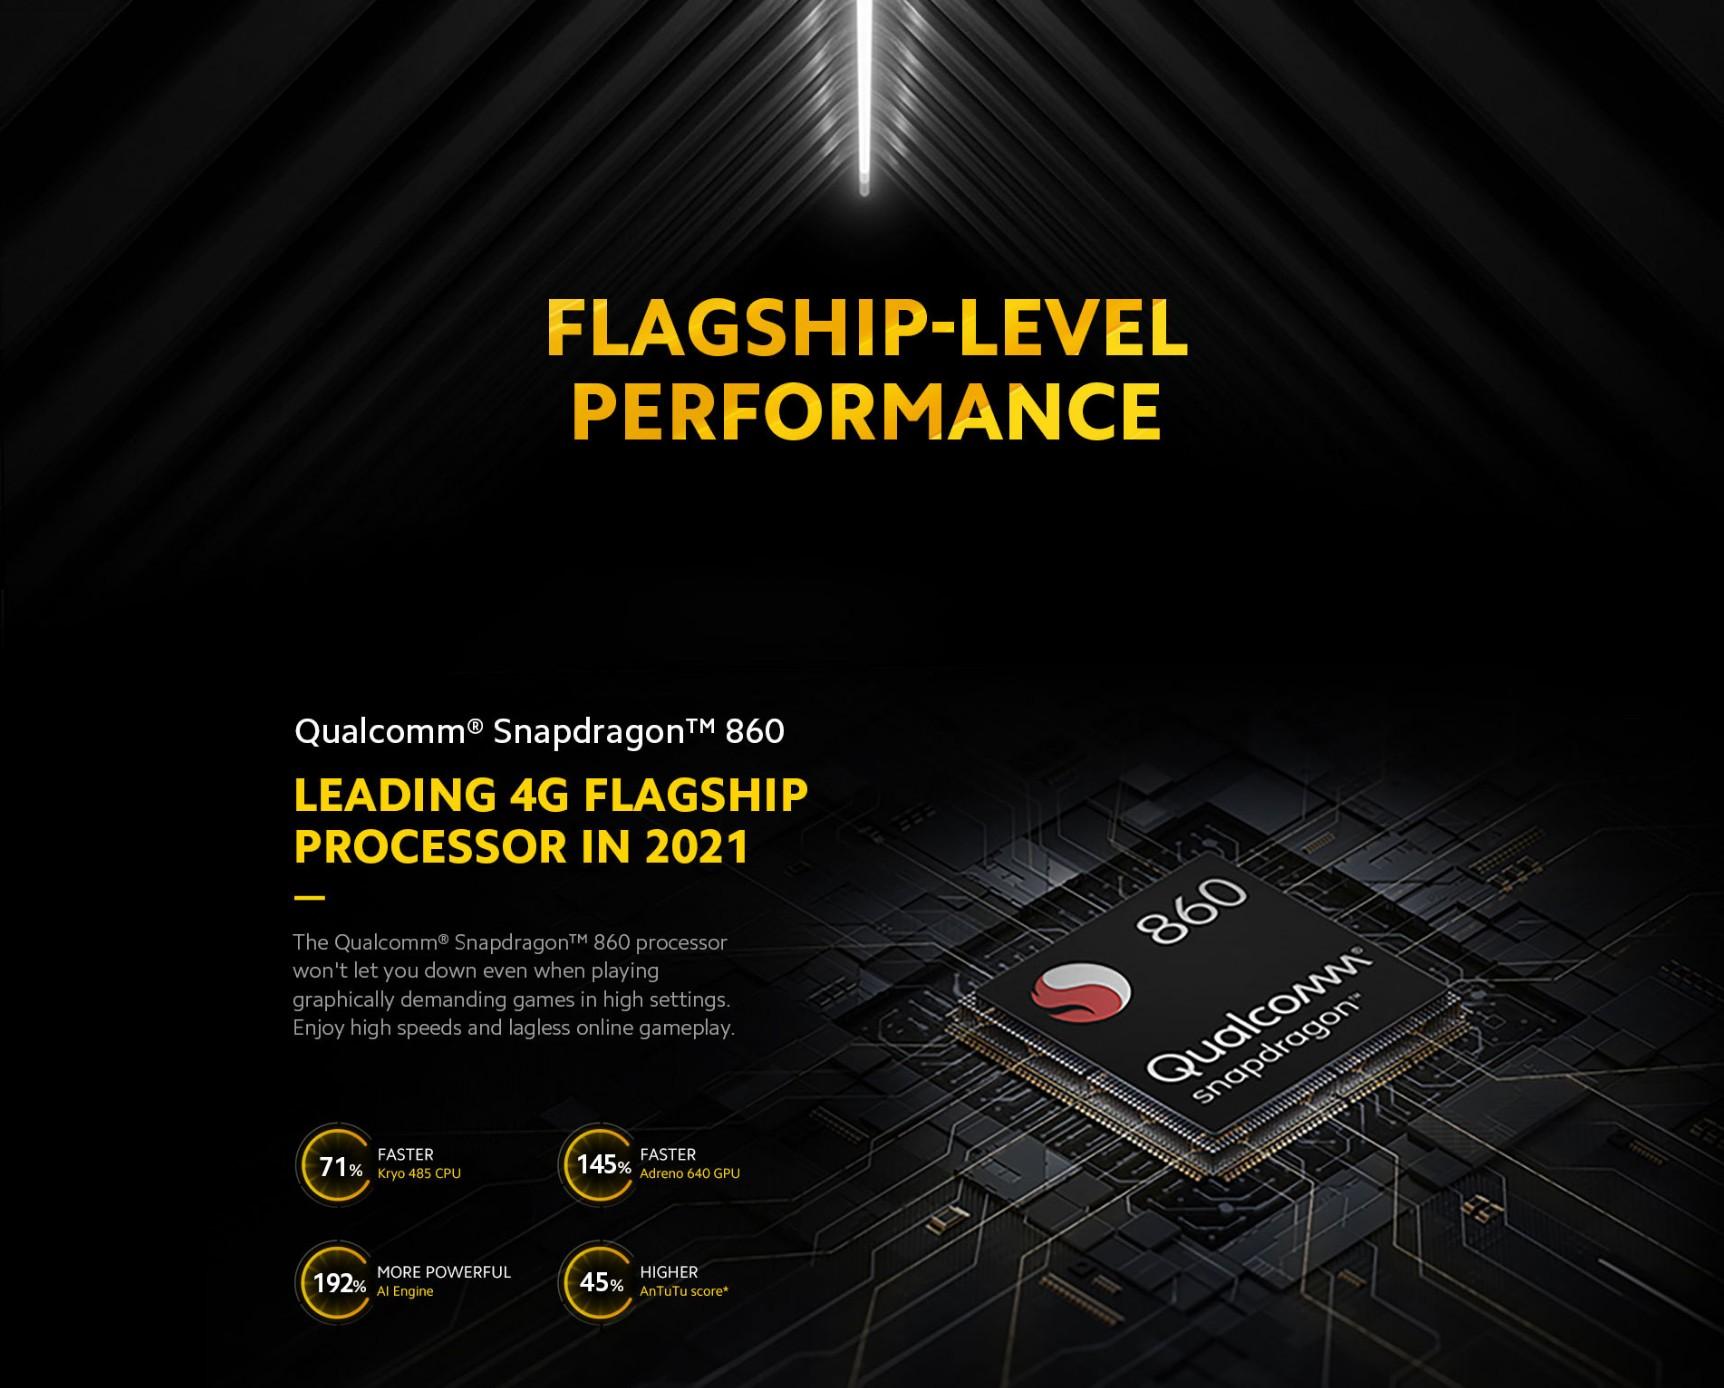 POCO X3 Pro - Snapdragon 860